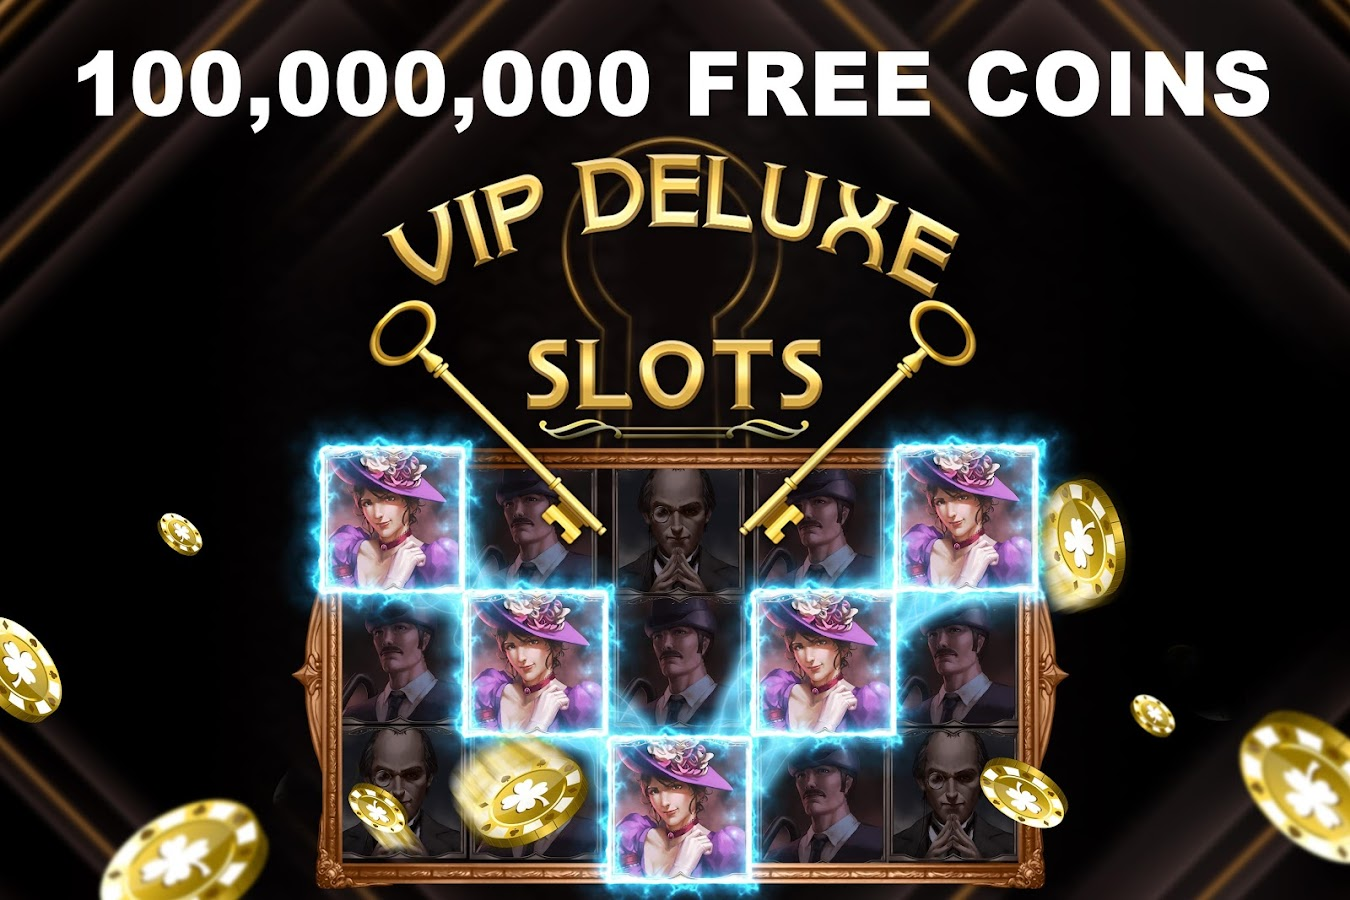 deluxe slot machine play